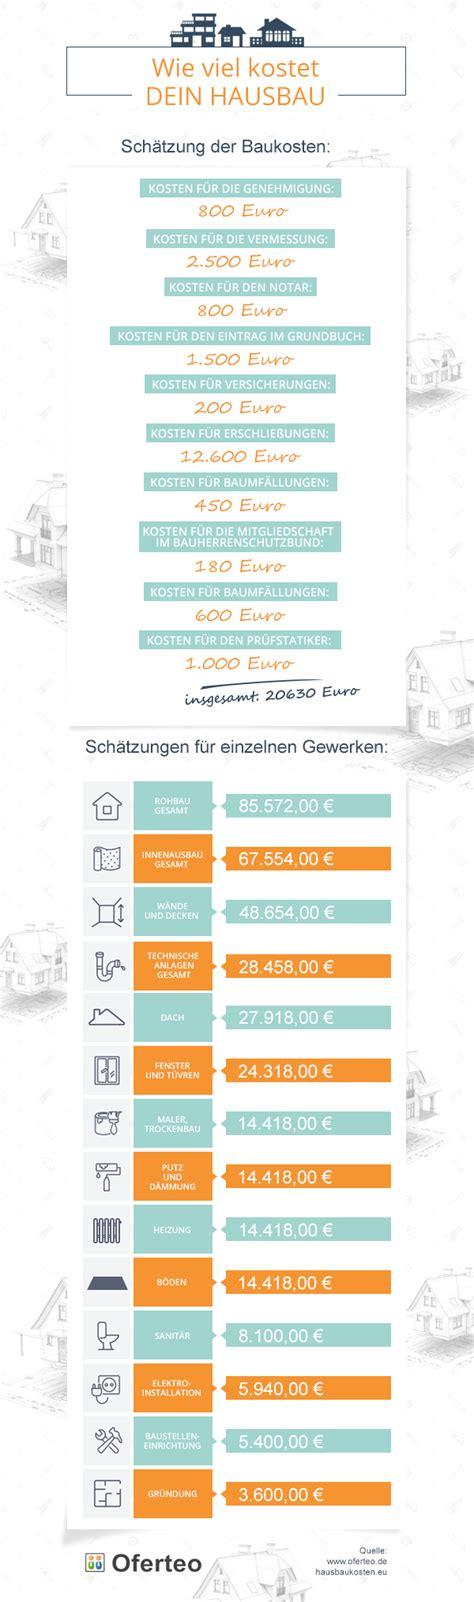 Dachbegrünung Kosten Pro Qm by Kernsanierung Kosten Pro Qm Heizkosten Pro Quadratmeter